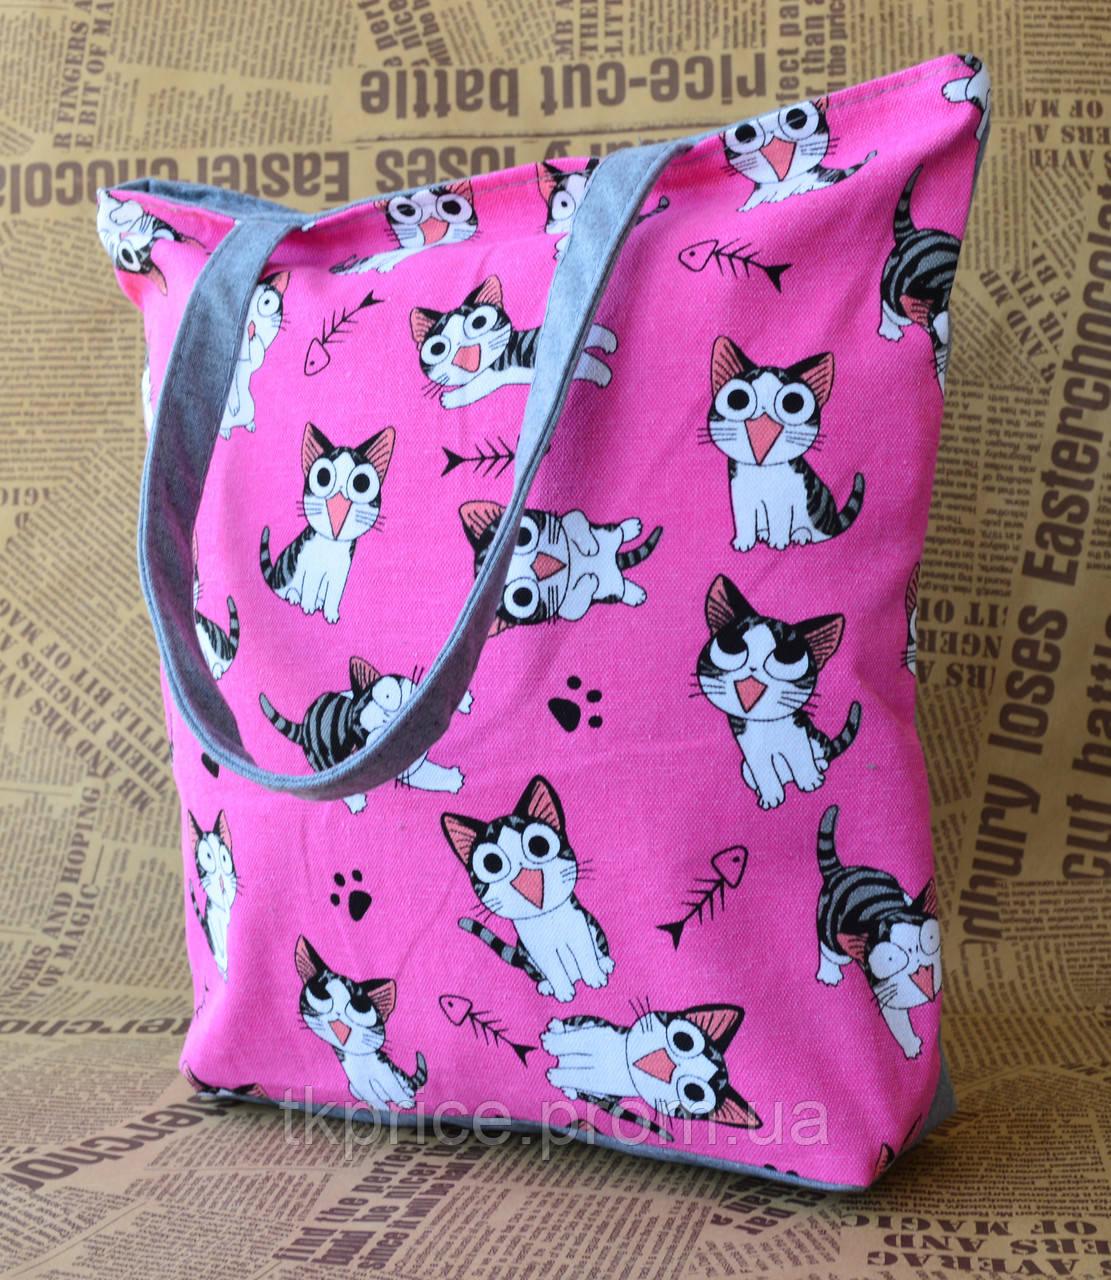 Стильная эко сумка с котиками